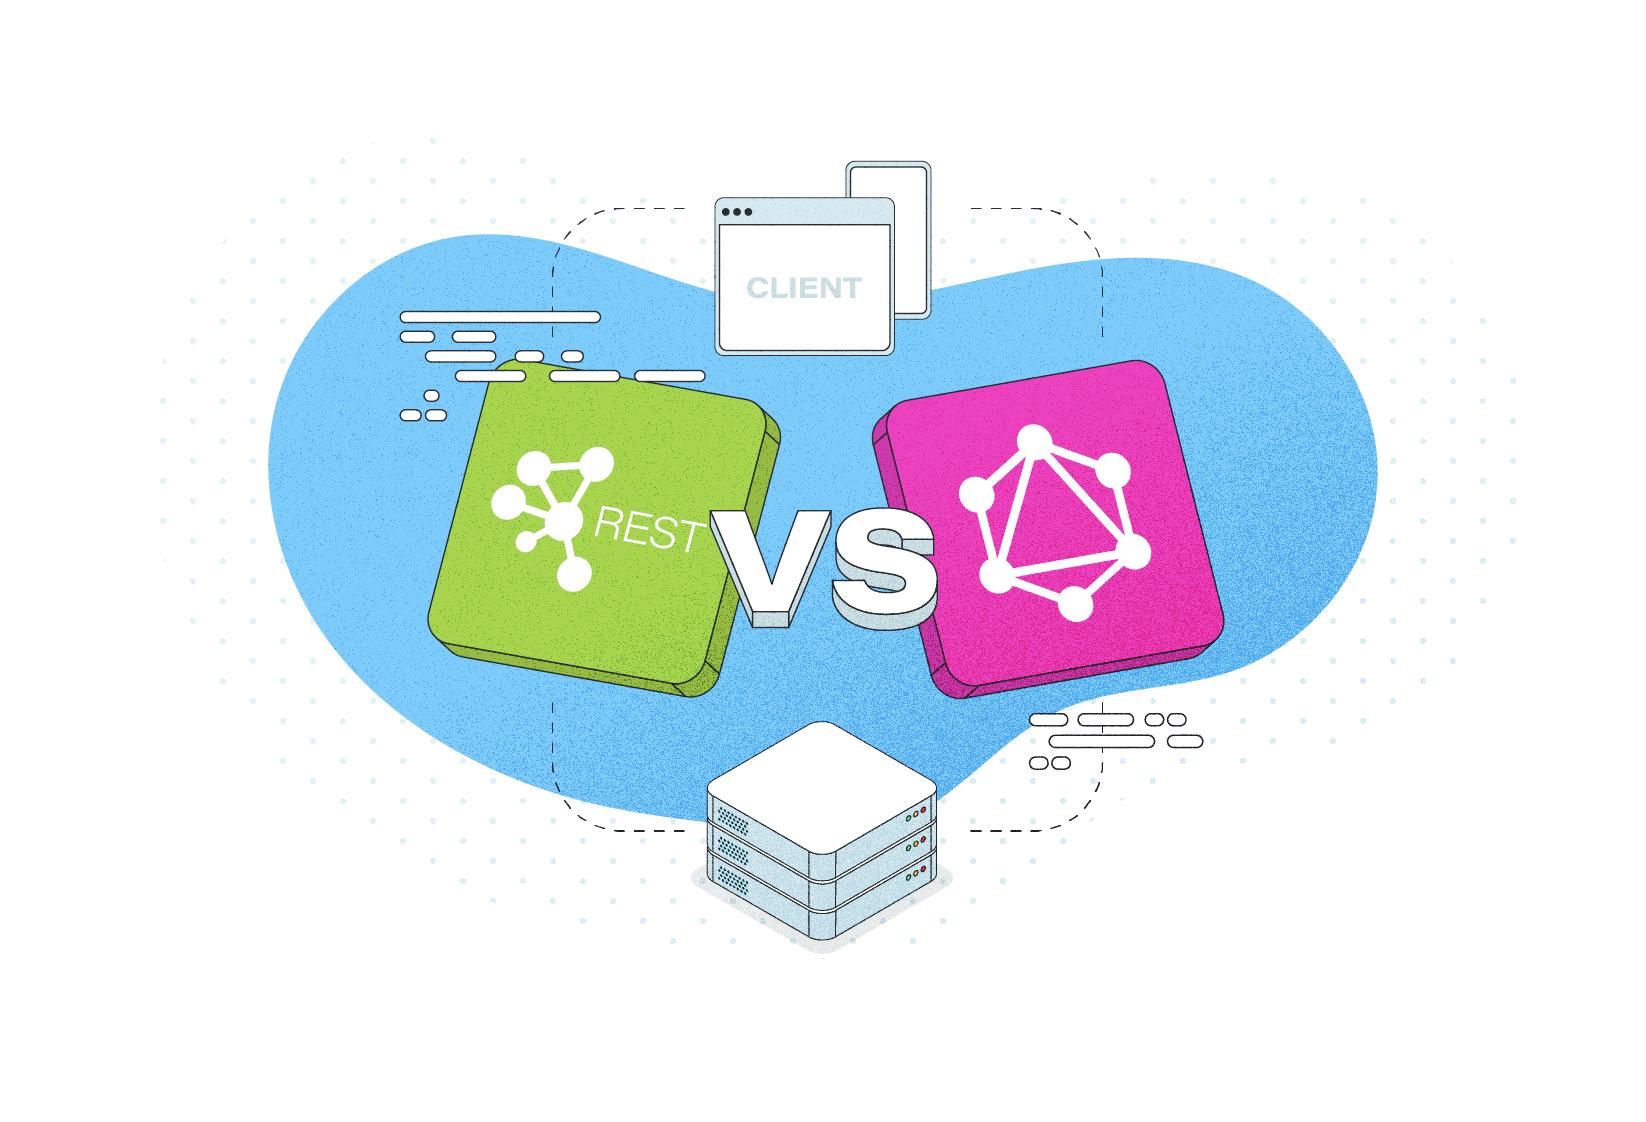 GraphQL vs REST – the battle of API designs